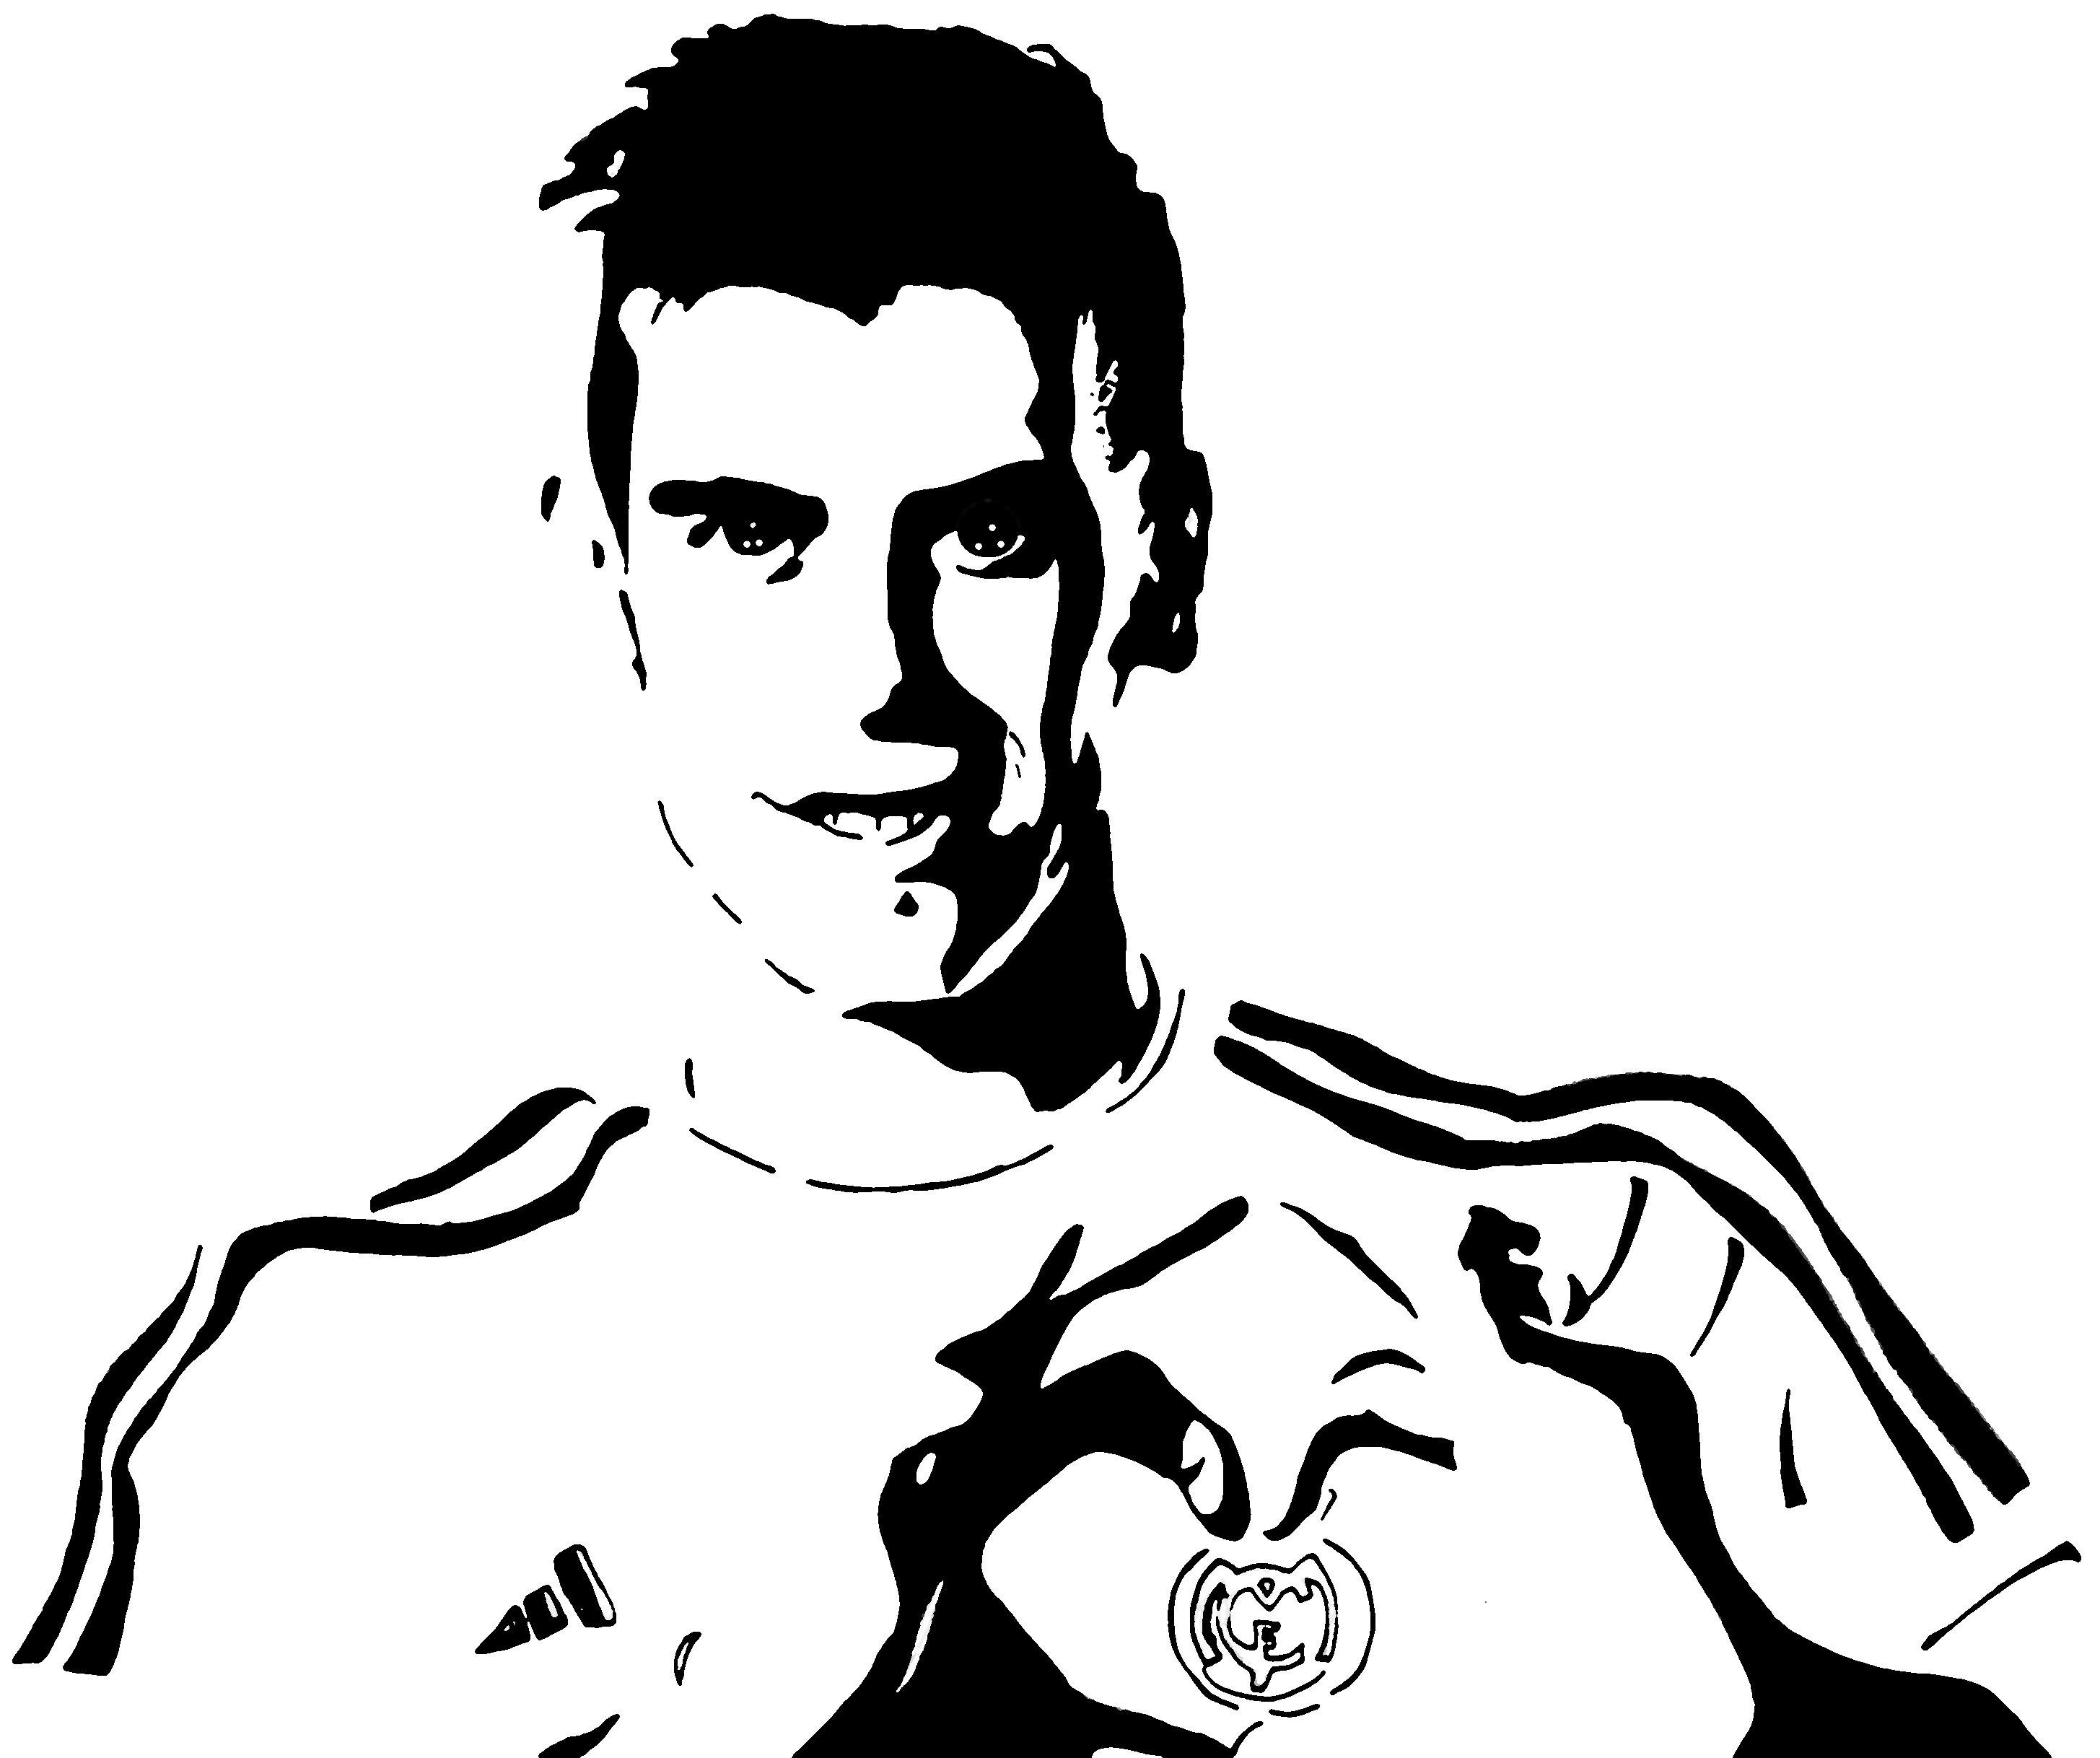 Frais Dessin A Colorier Foot Ronaldo